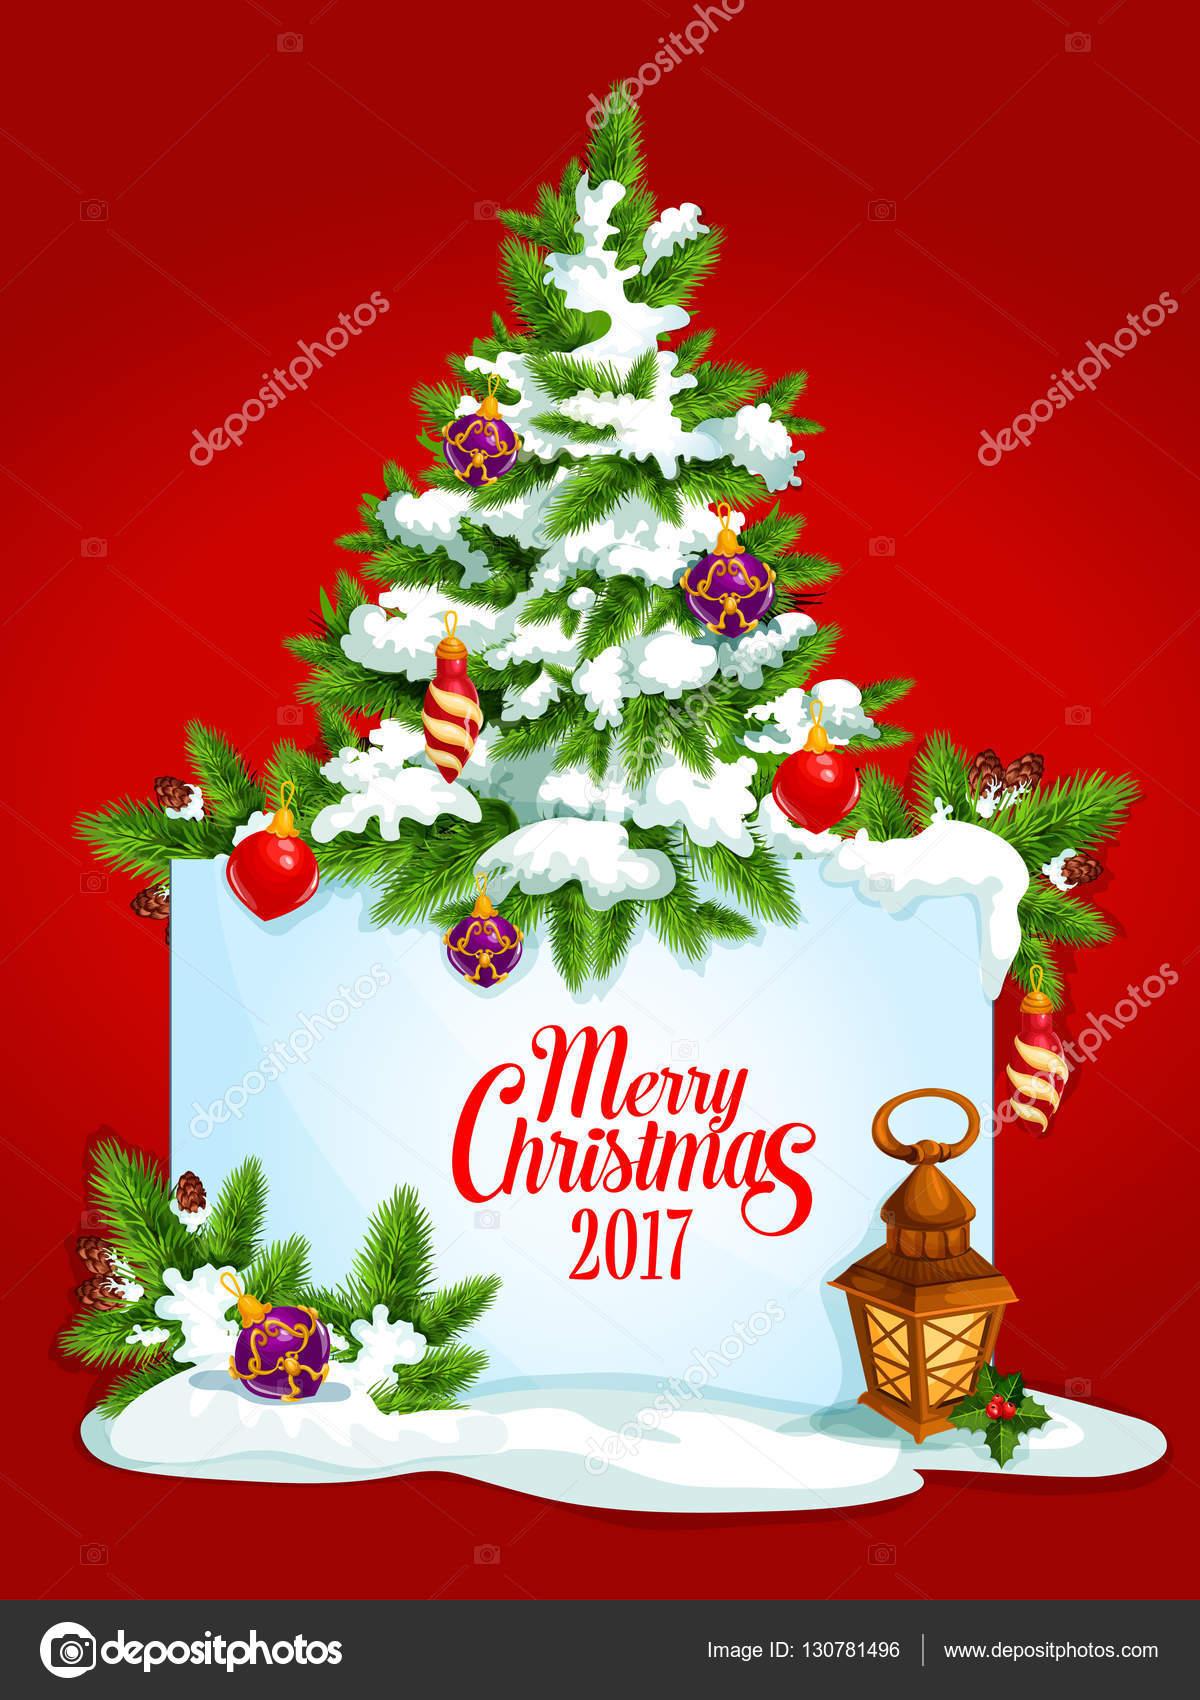 Merry Christmas Tree Vektor Plakat, Grußkarte — Stockvektor ...